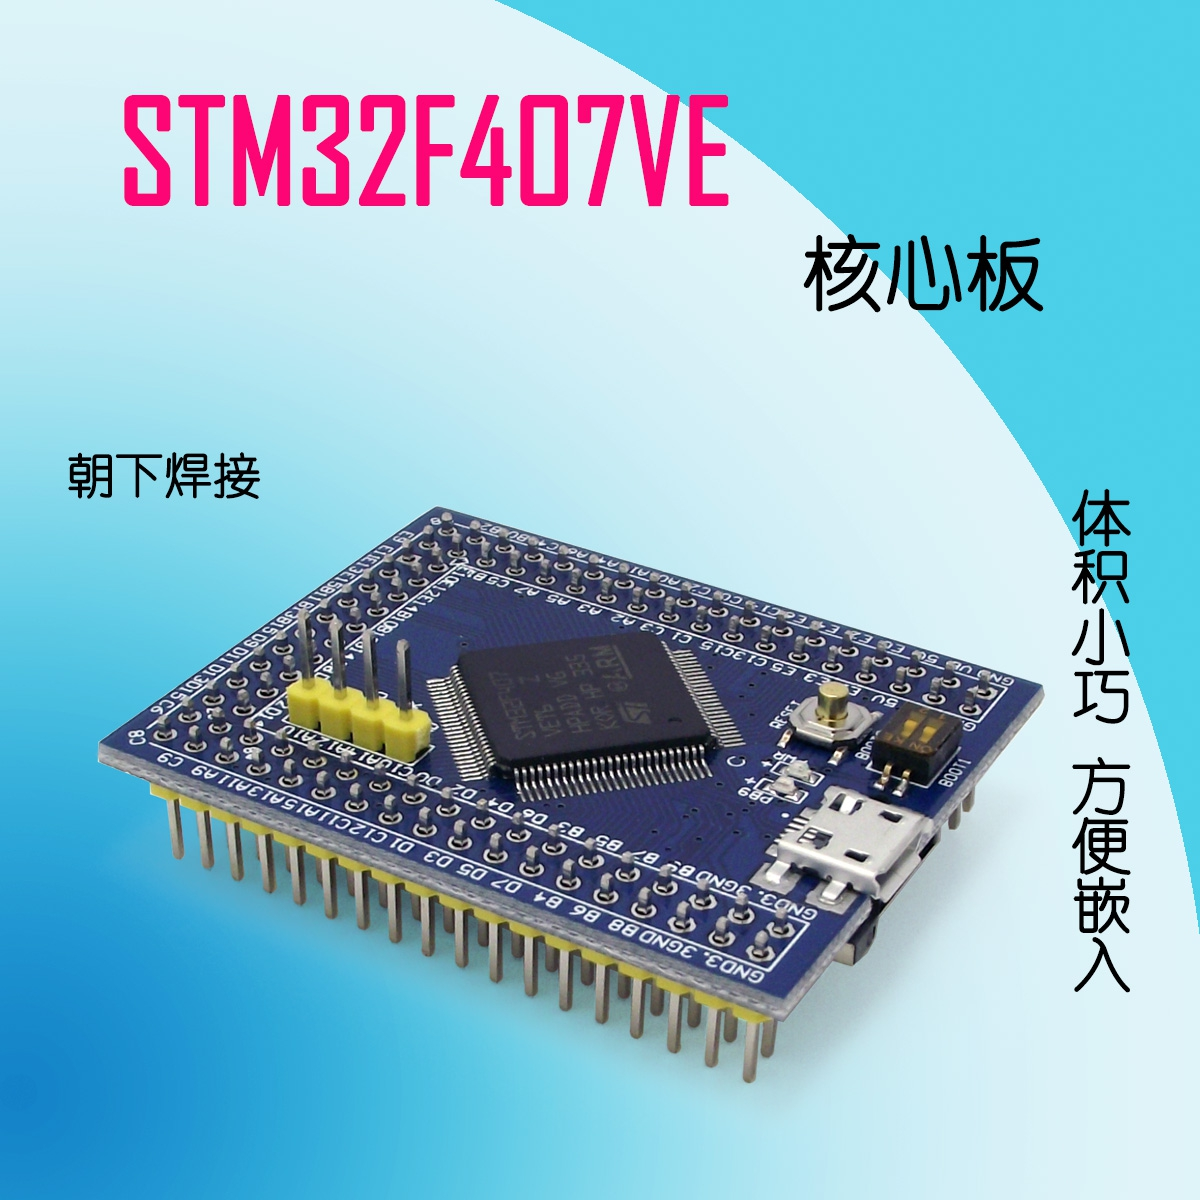 Source STM32F407VET6 Version Mini Version of the STM32 ARMCortex-M4 Core Board System кухонная мойка ukinox stm 800 600 20 6